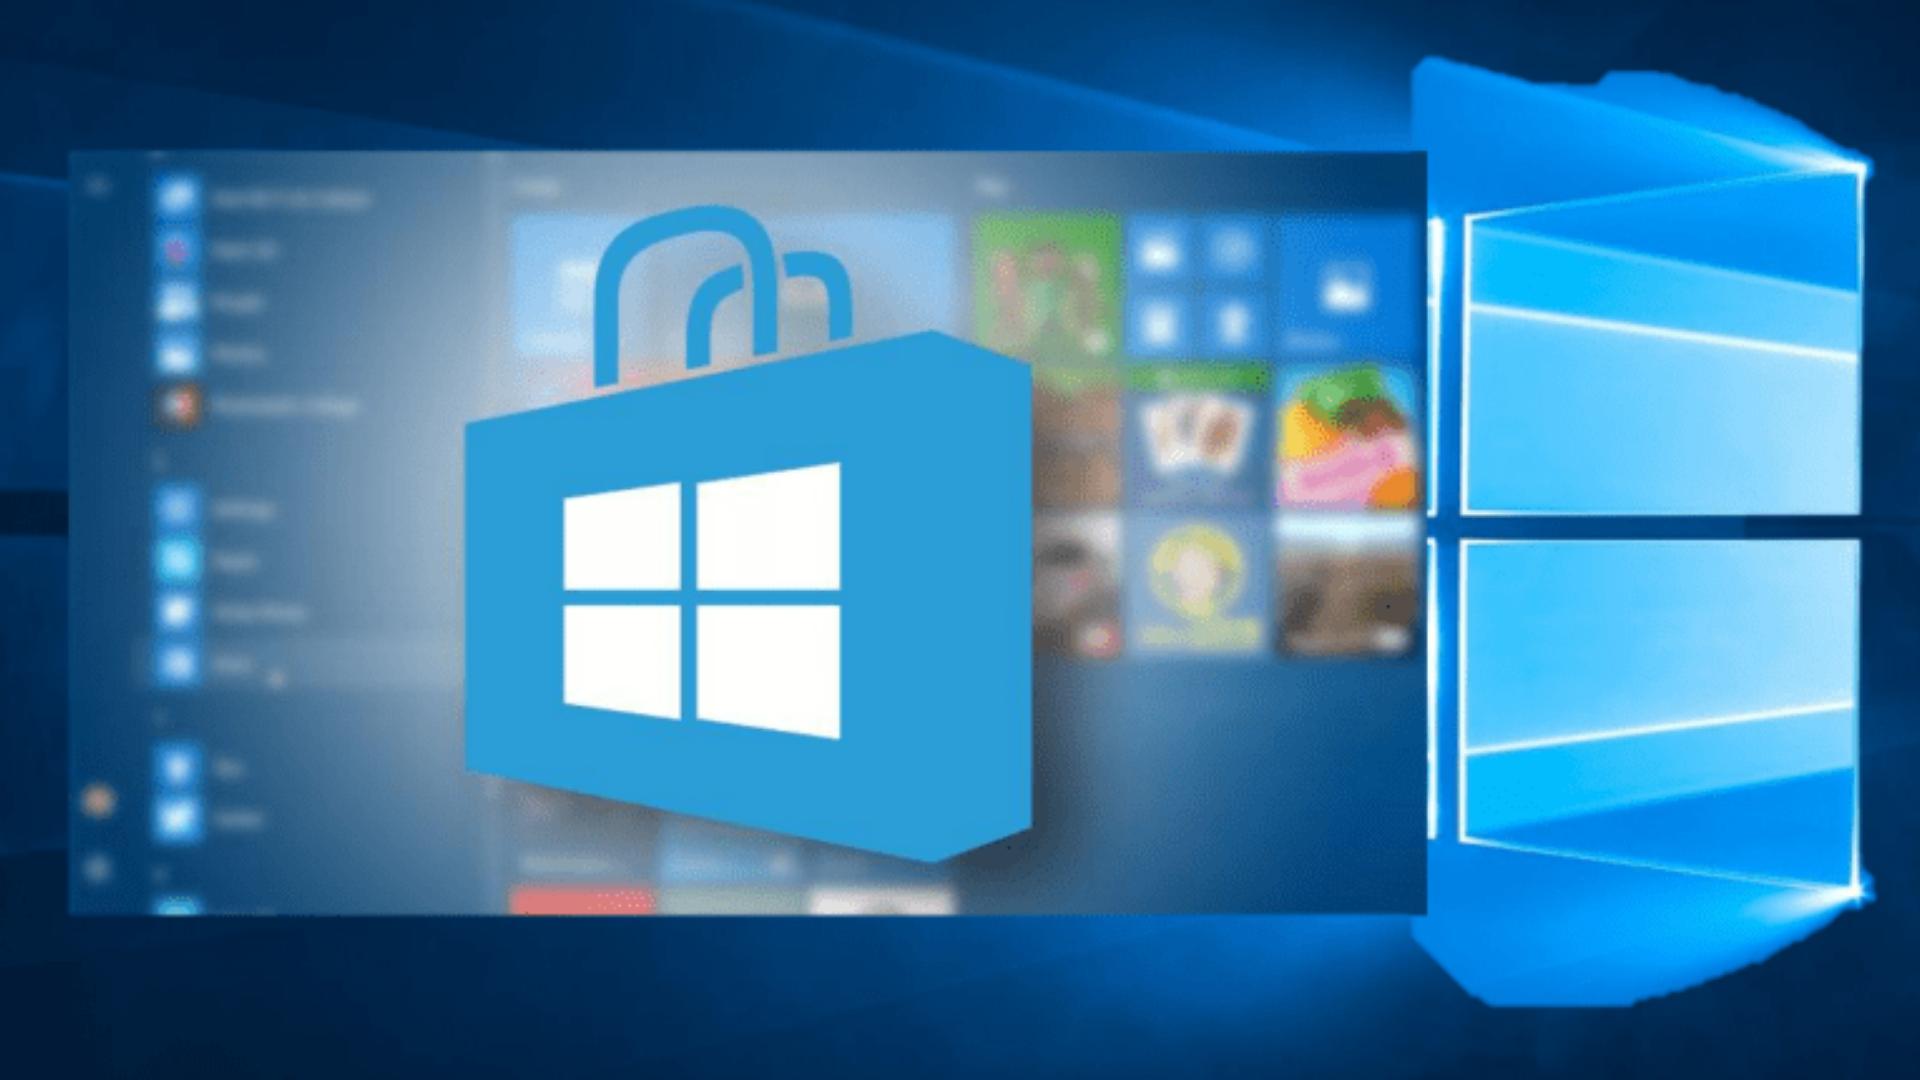 Windows 10 Hata Kodu 0x80070005 Windows Store Hatası